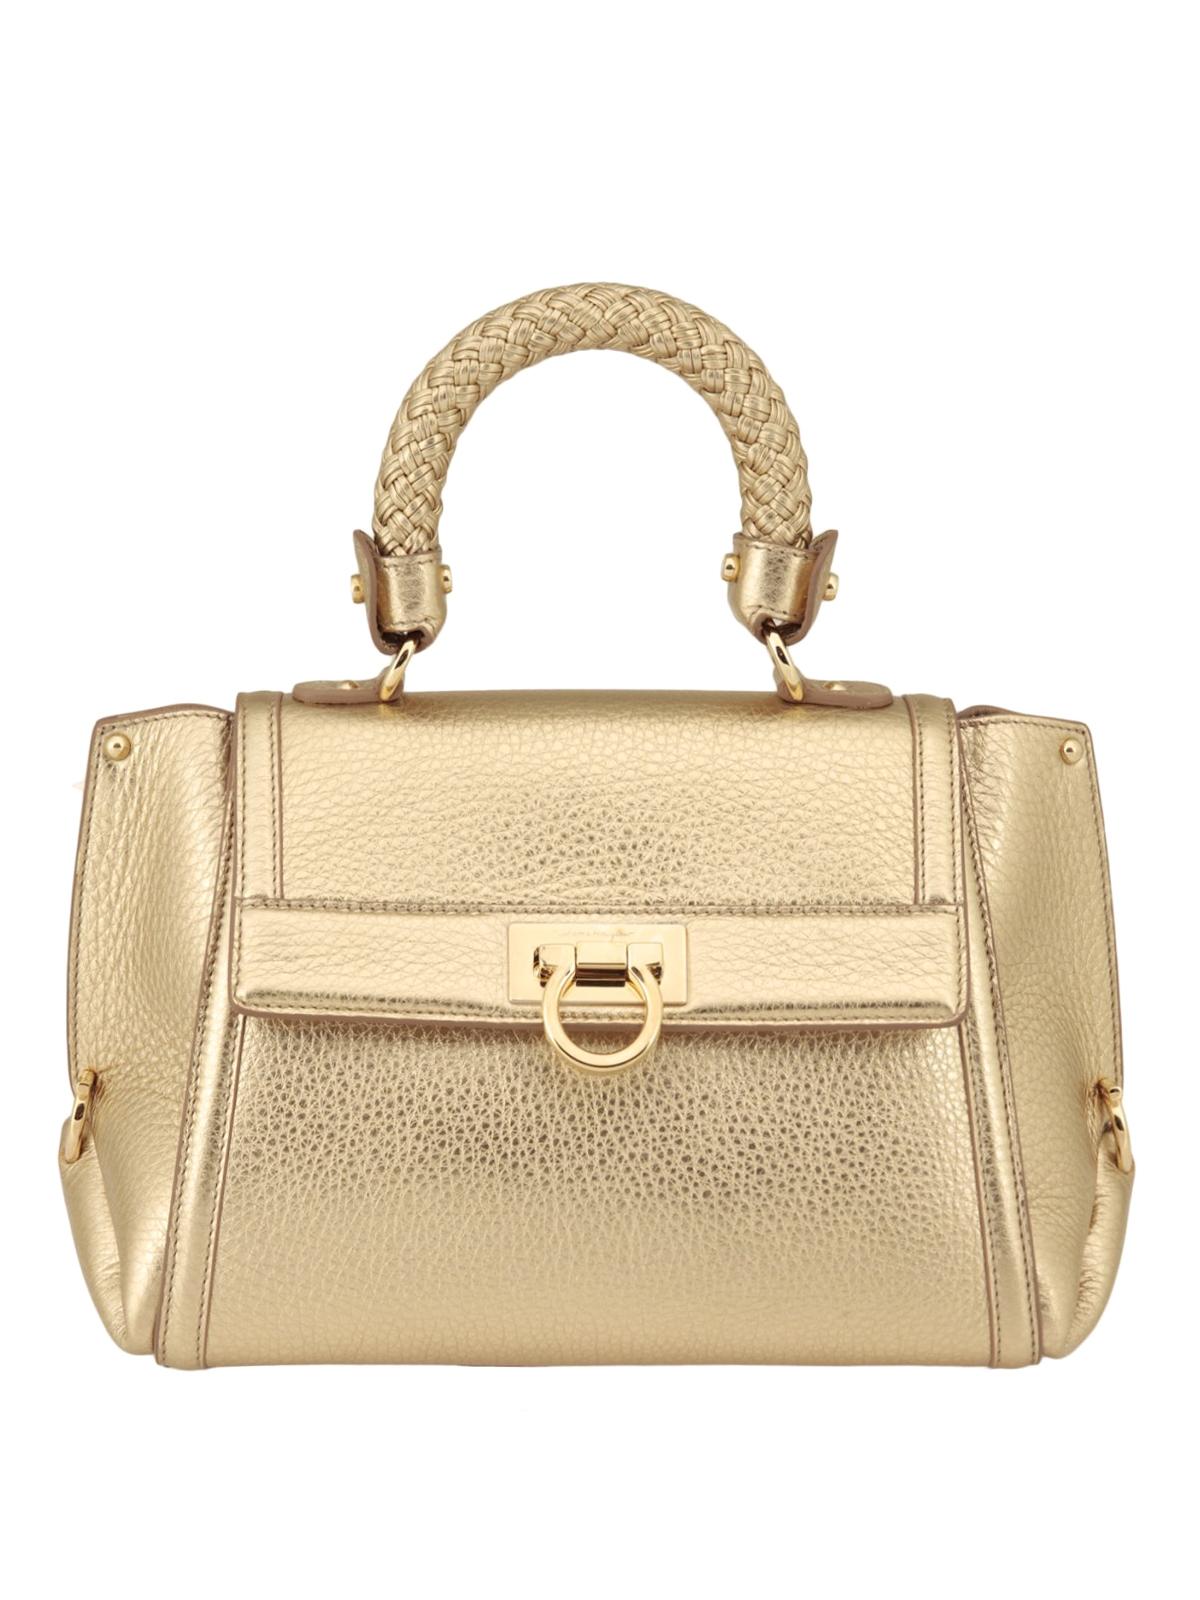 533cd4ef417c ... online da953 da0f1  SALVATORE FERRAGAMO bowling bags - Sofia woven  handle leather bag finest selection 685b9 b6e3f ...